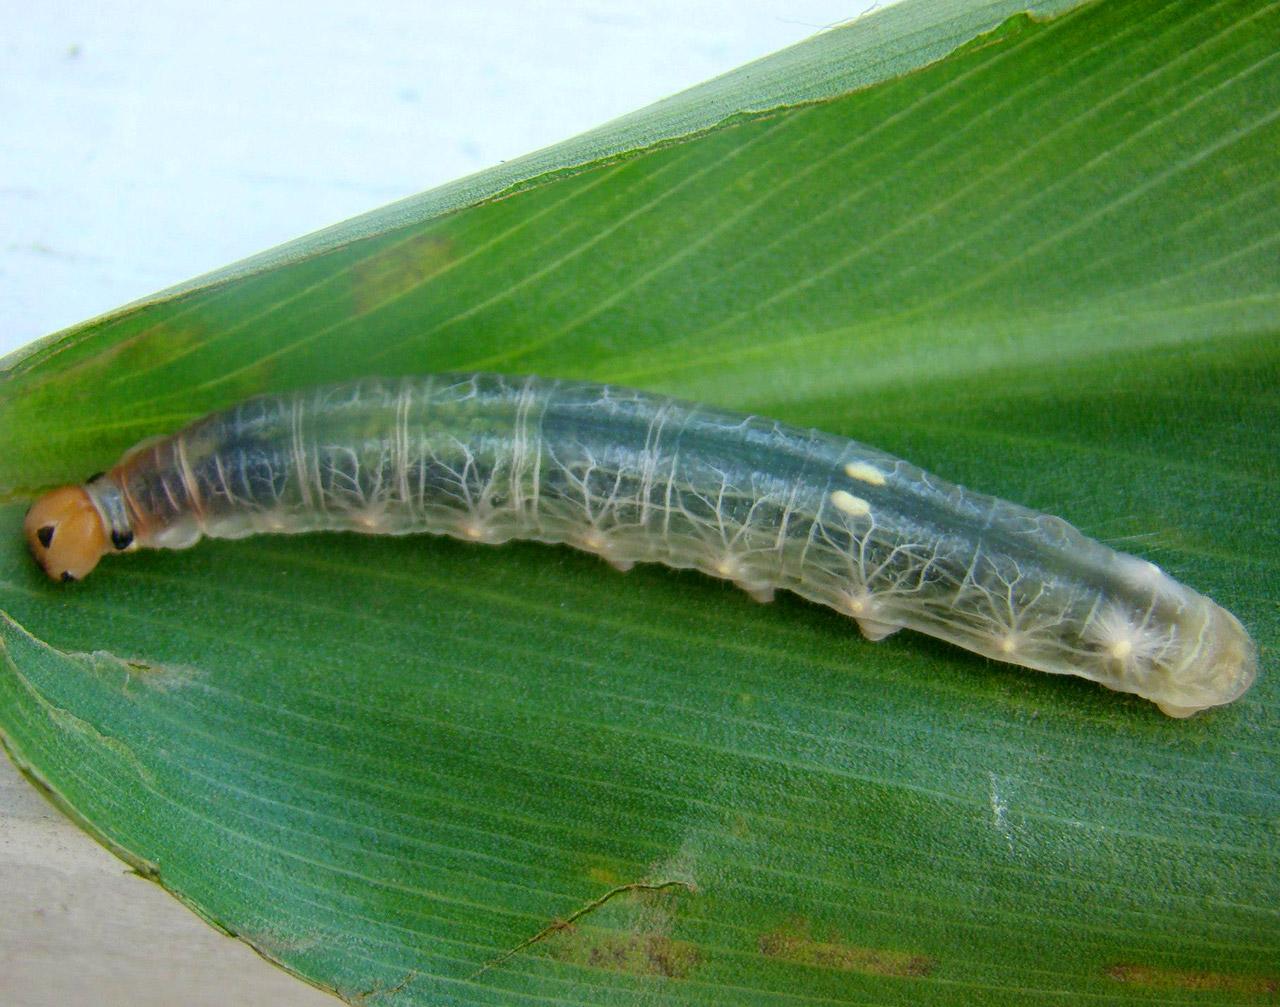 Brazilian Skipper Caterpillar Translucent Transparent Body